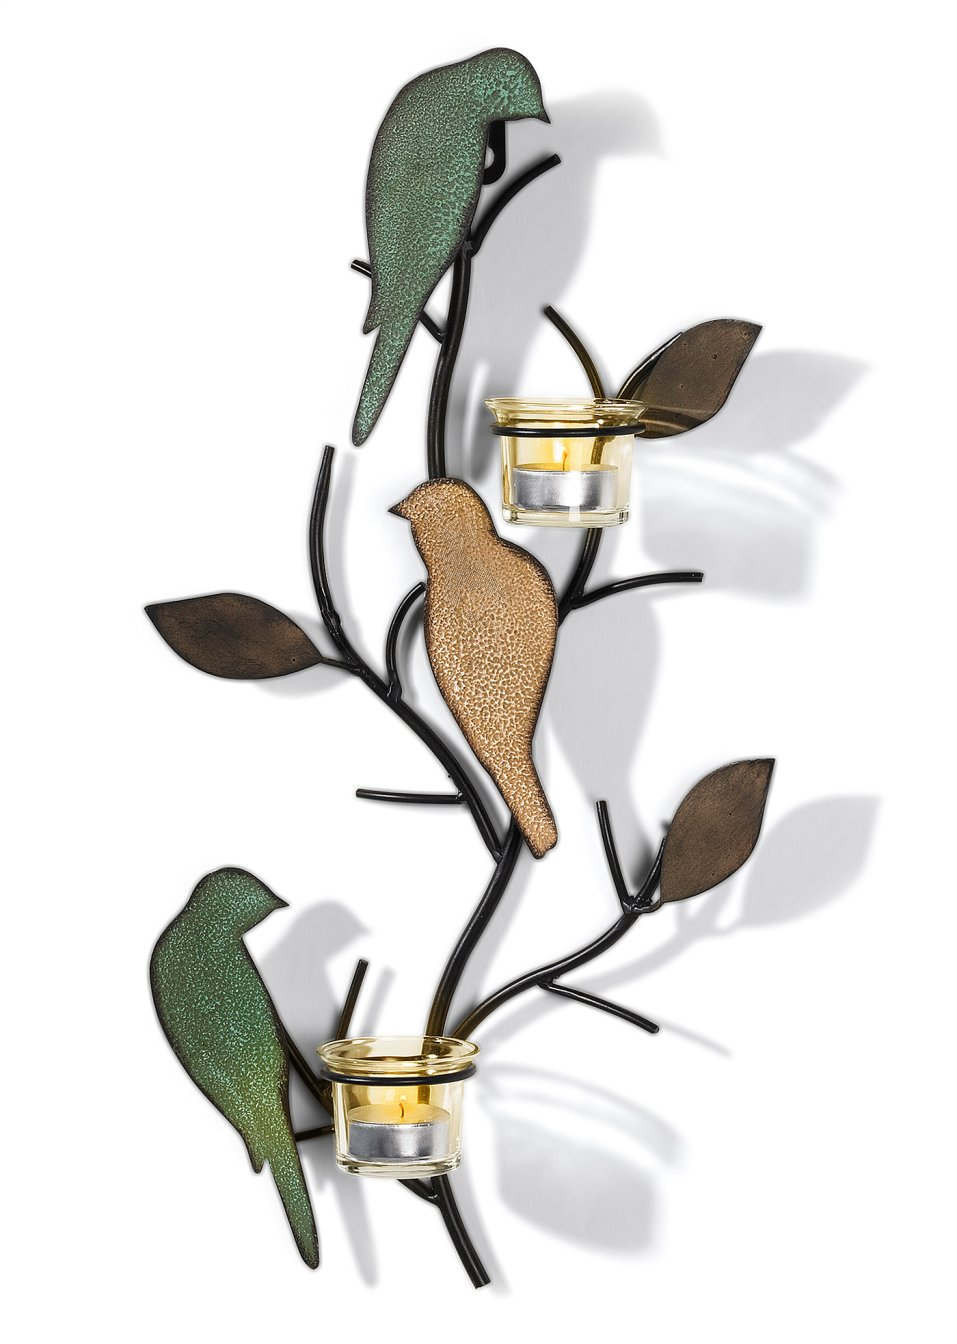 Portacandele da parete uccelli petrolio verde chiaro - Portacandele da parete ...